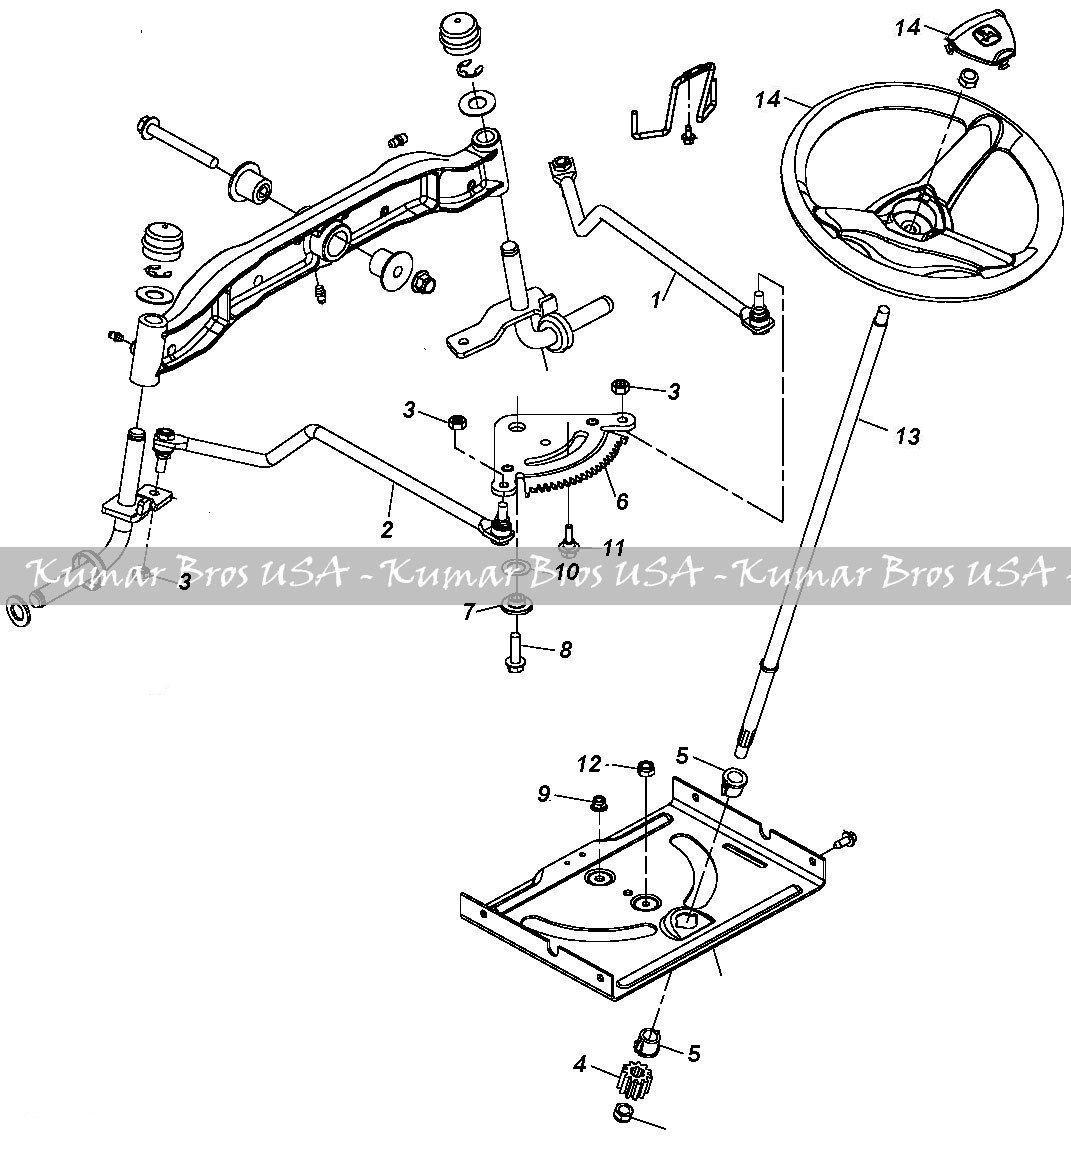 New Kumar Bros Usa Steering Kit Shaft Amp Wheel Fits John Deere Tractor La100 La110 La120 La130 La145